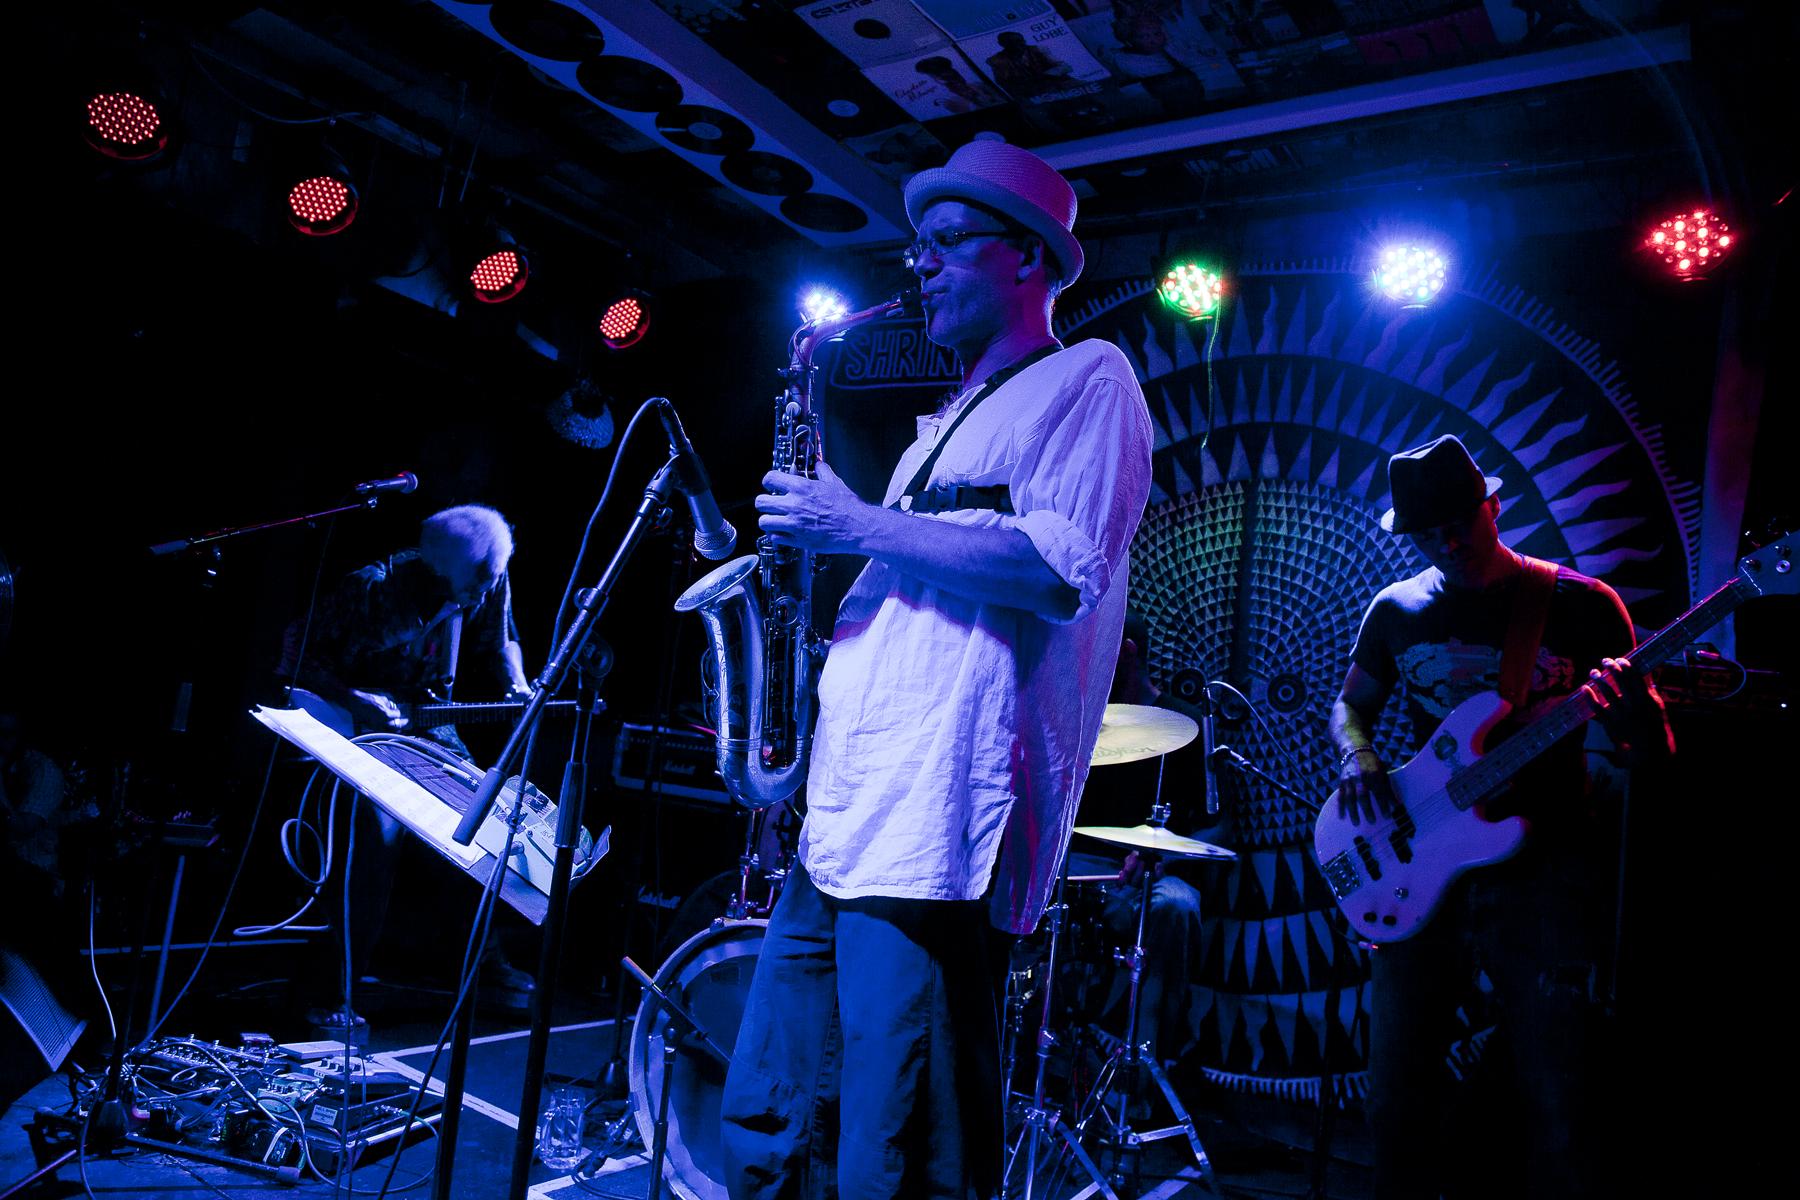 Welf Dorr, On Ka'a Davis and the Original Djuke Music Players